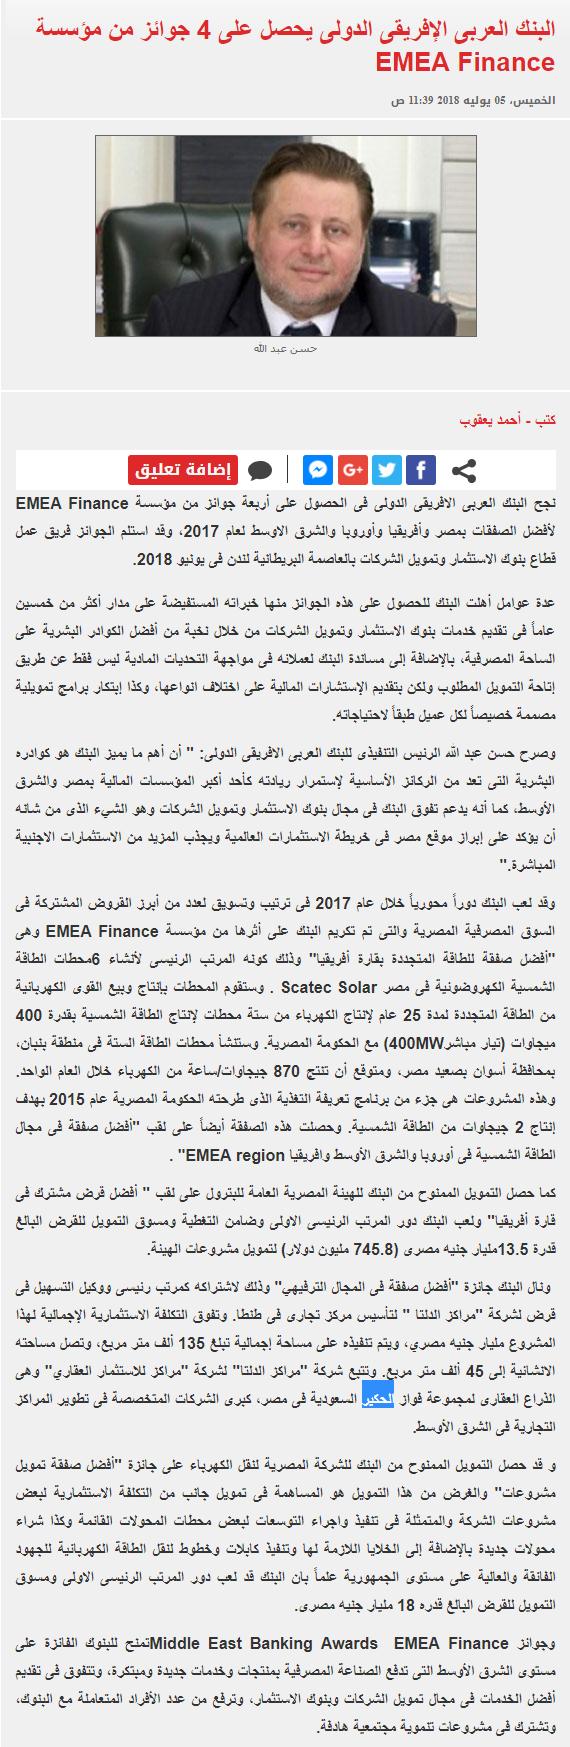 FireShot Capture 990 - البنك العربى الإفريقى الدولى يحصل على_ - https___www.youm7.com_story_2018_7.png